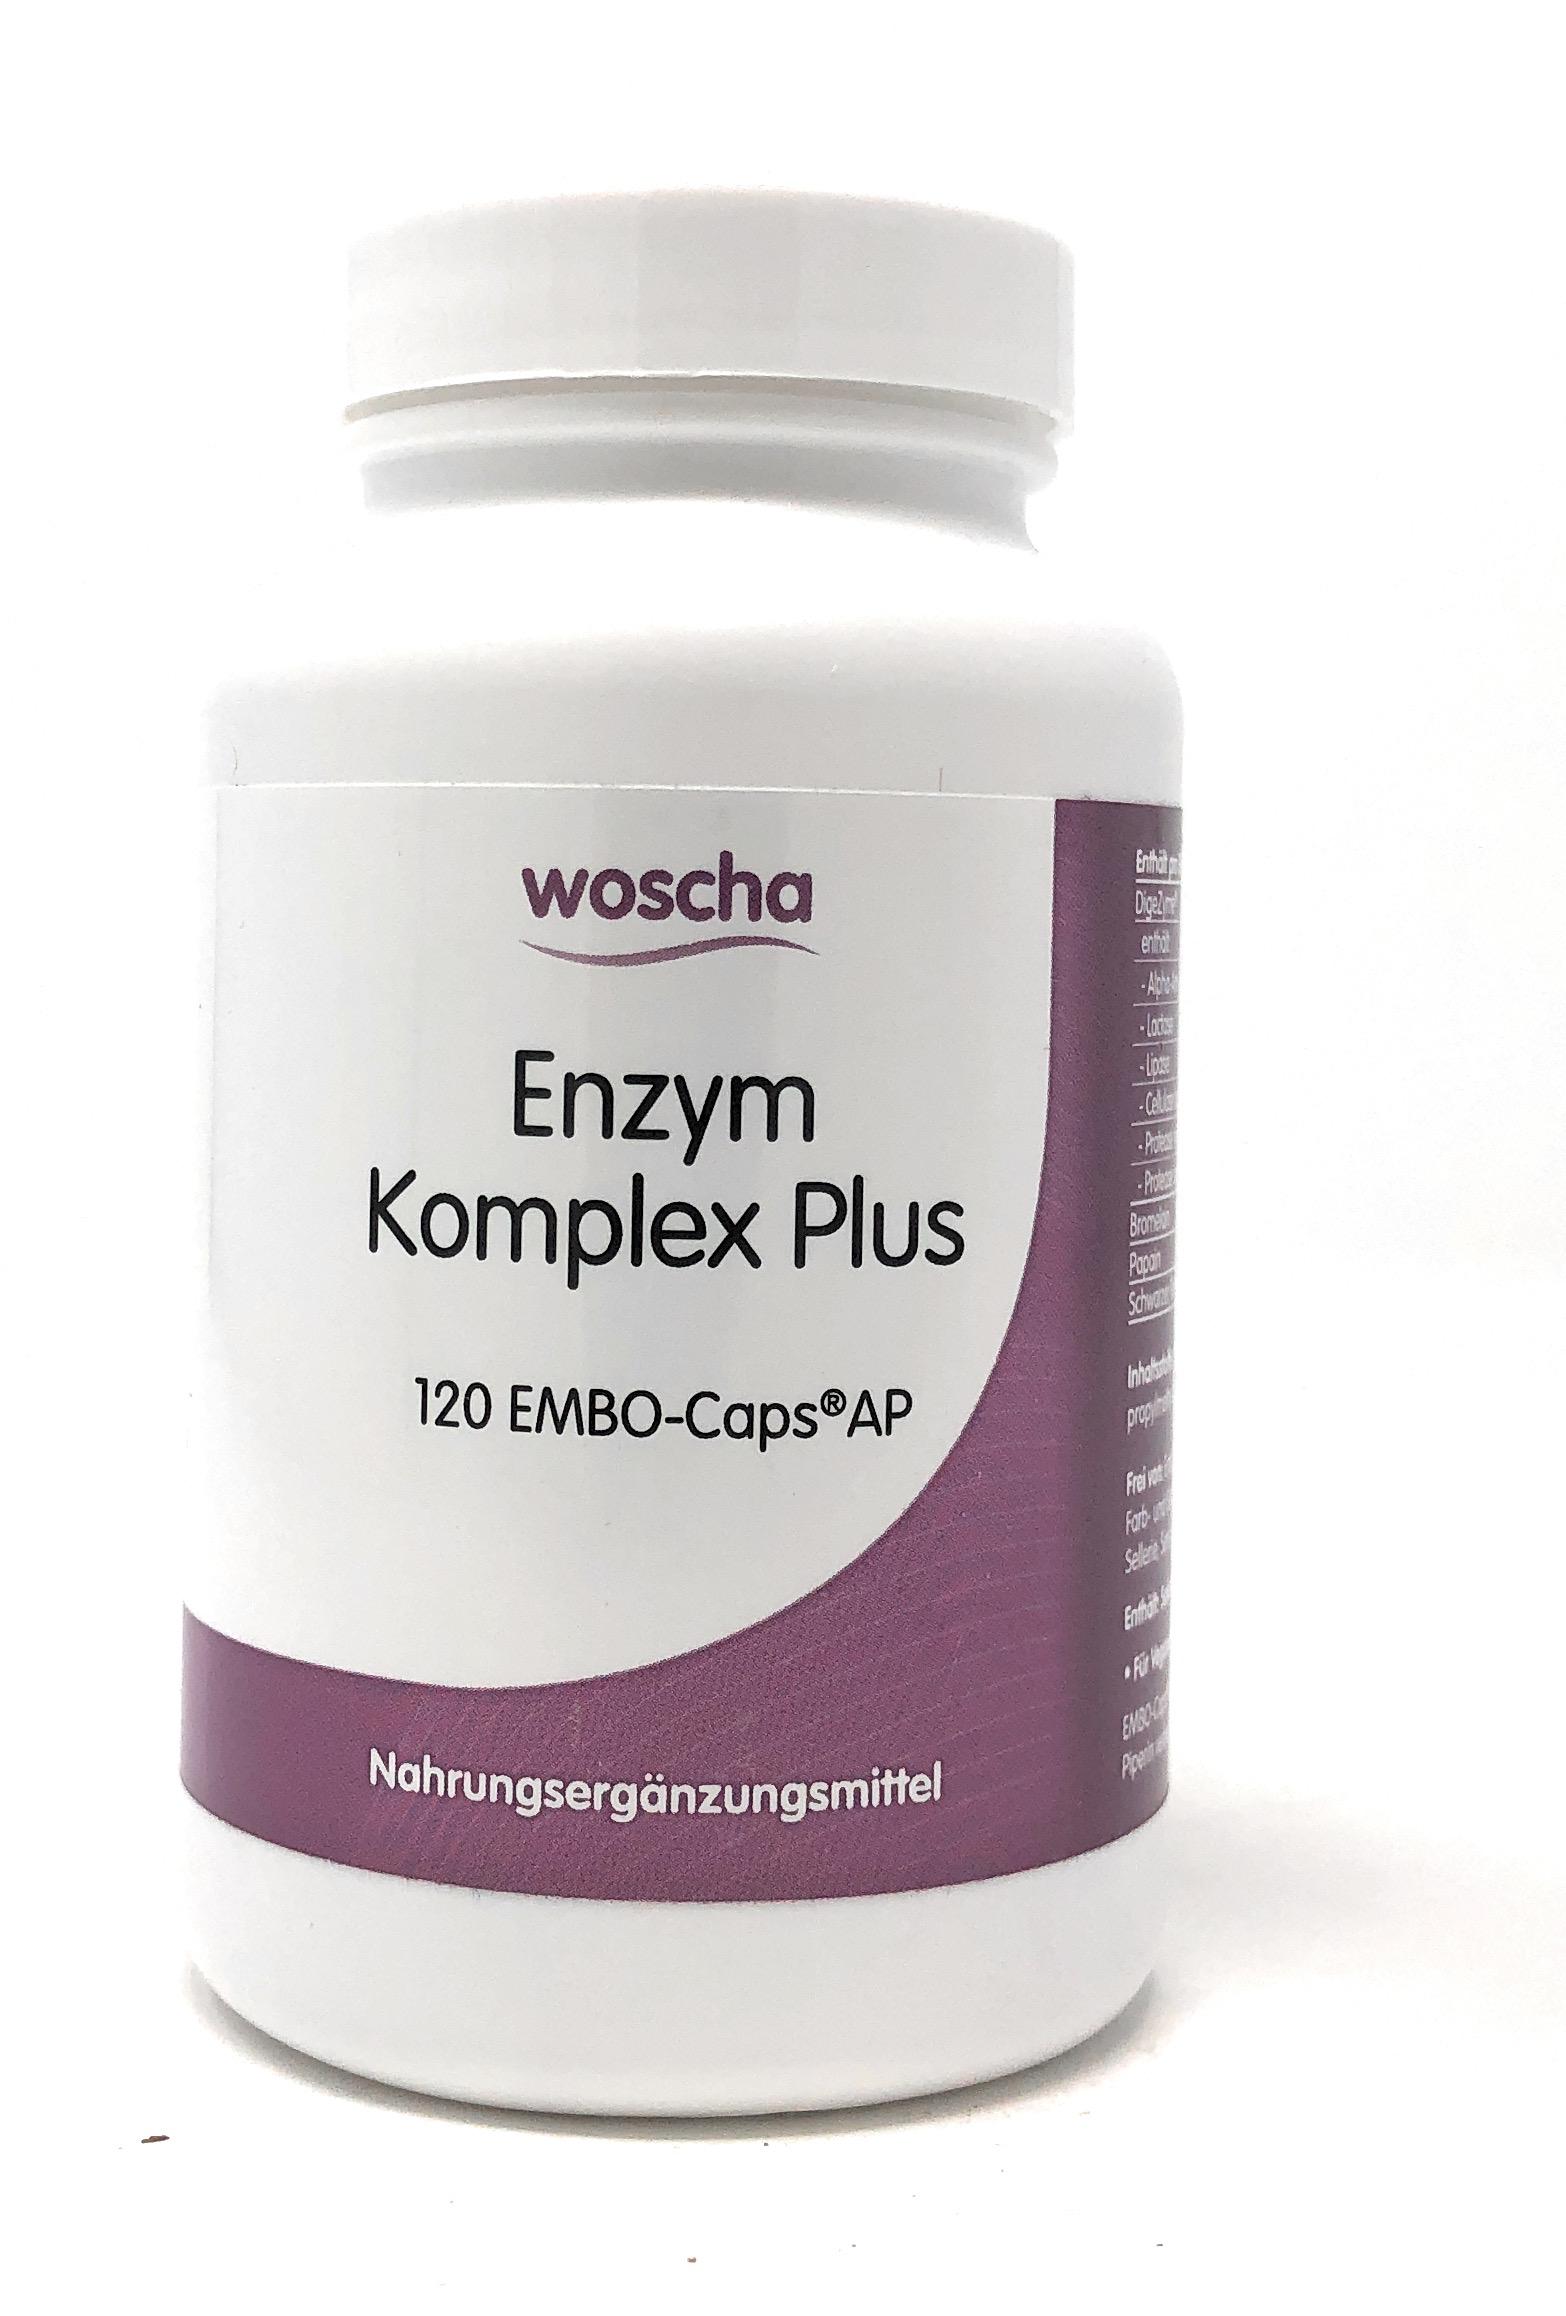 woscha Enzym Komplex Plus 120 Embo-Caps AP (72g) (vegan)